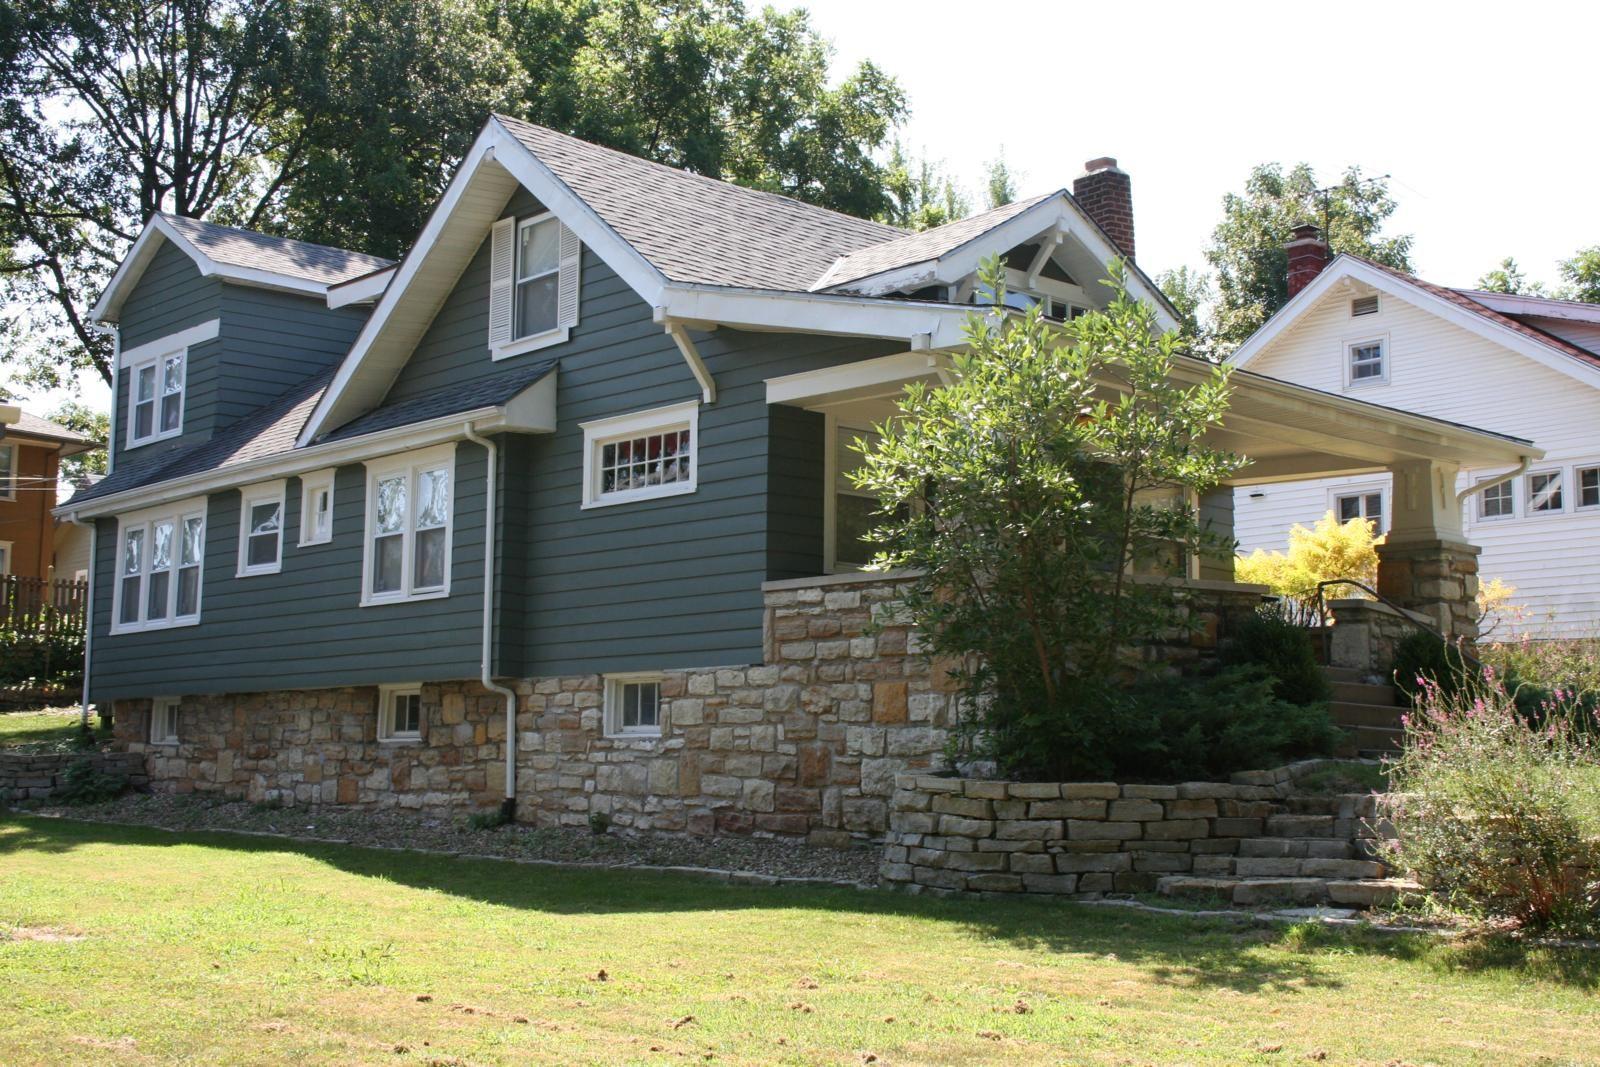 Wood Siding And Brick Exterior Blue Gray Paint With White Trim House Exterior House Exterior Blue Wood Siding House